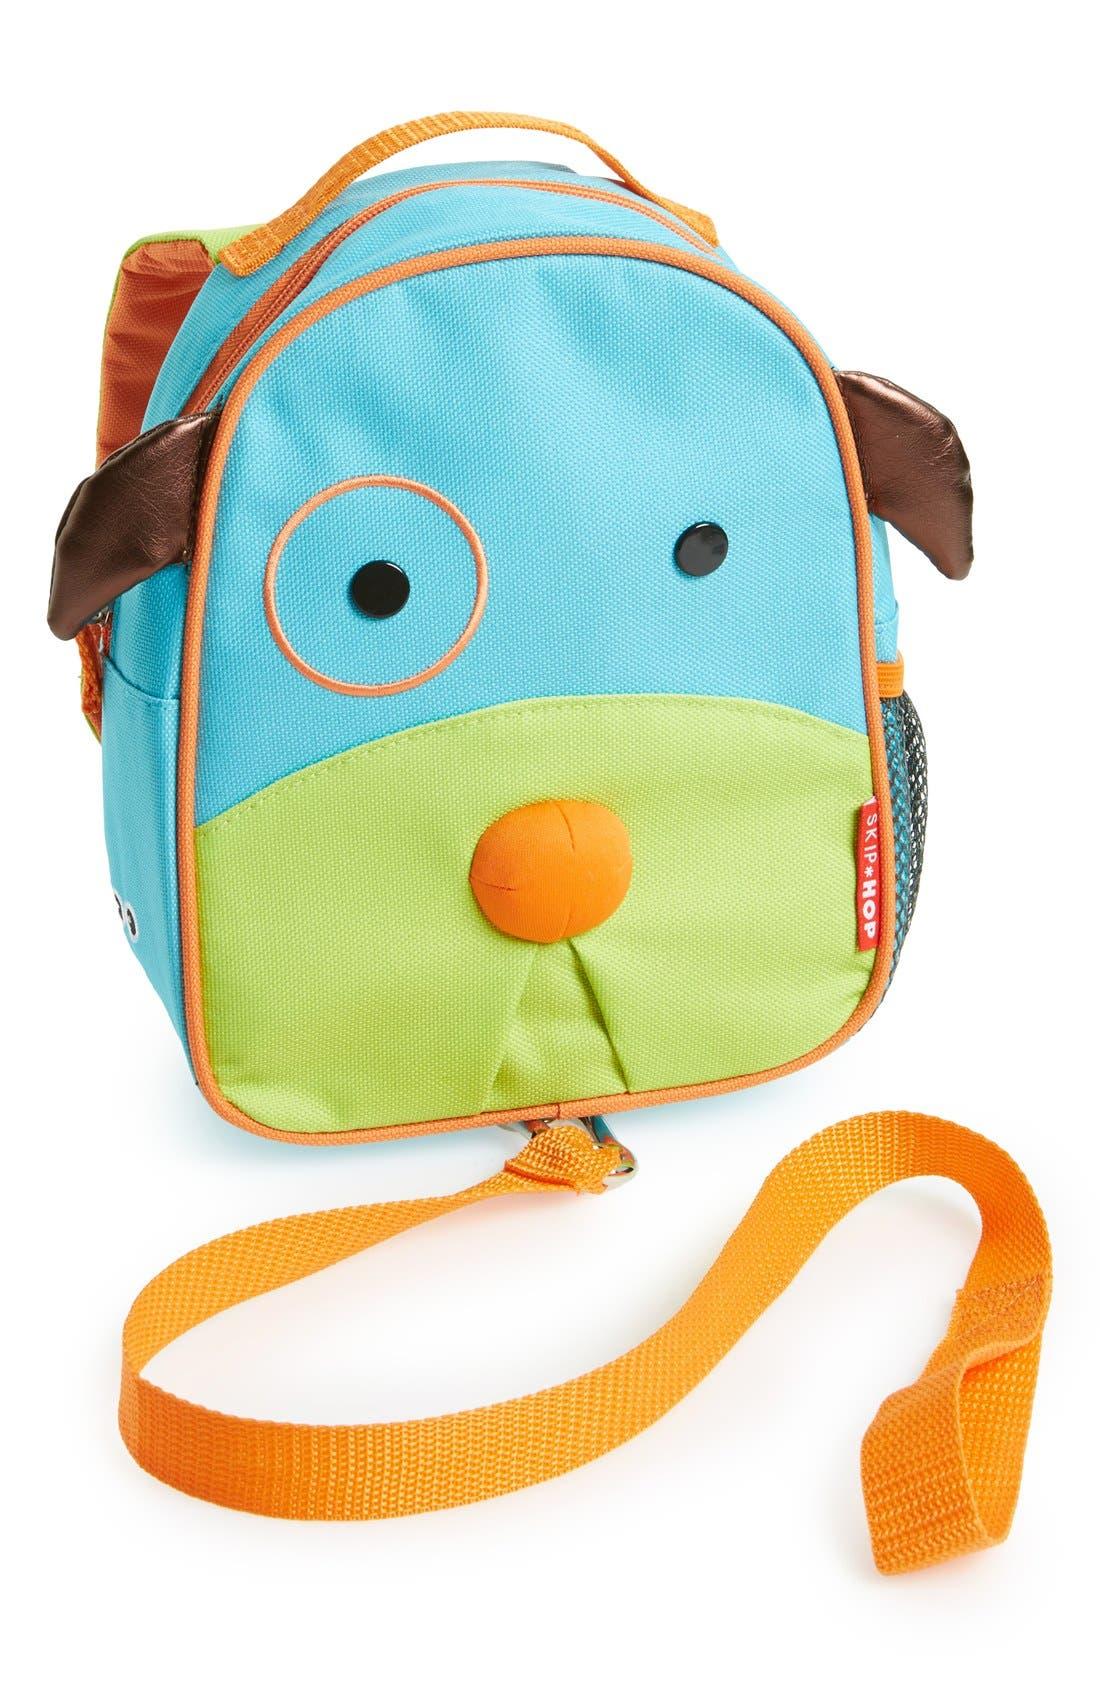 Skip Hop 'Zoo' Safety Harness Backpack (Kids)